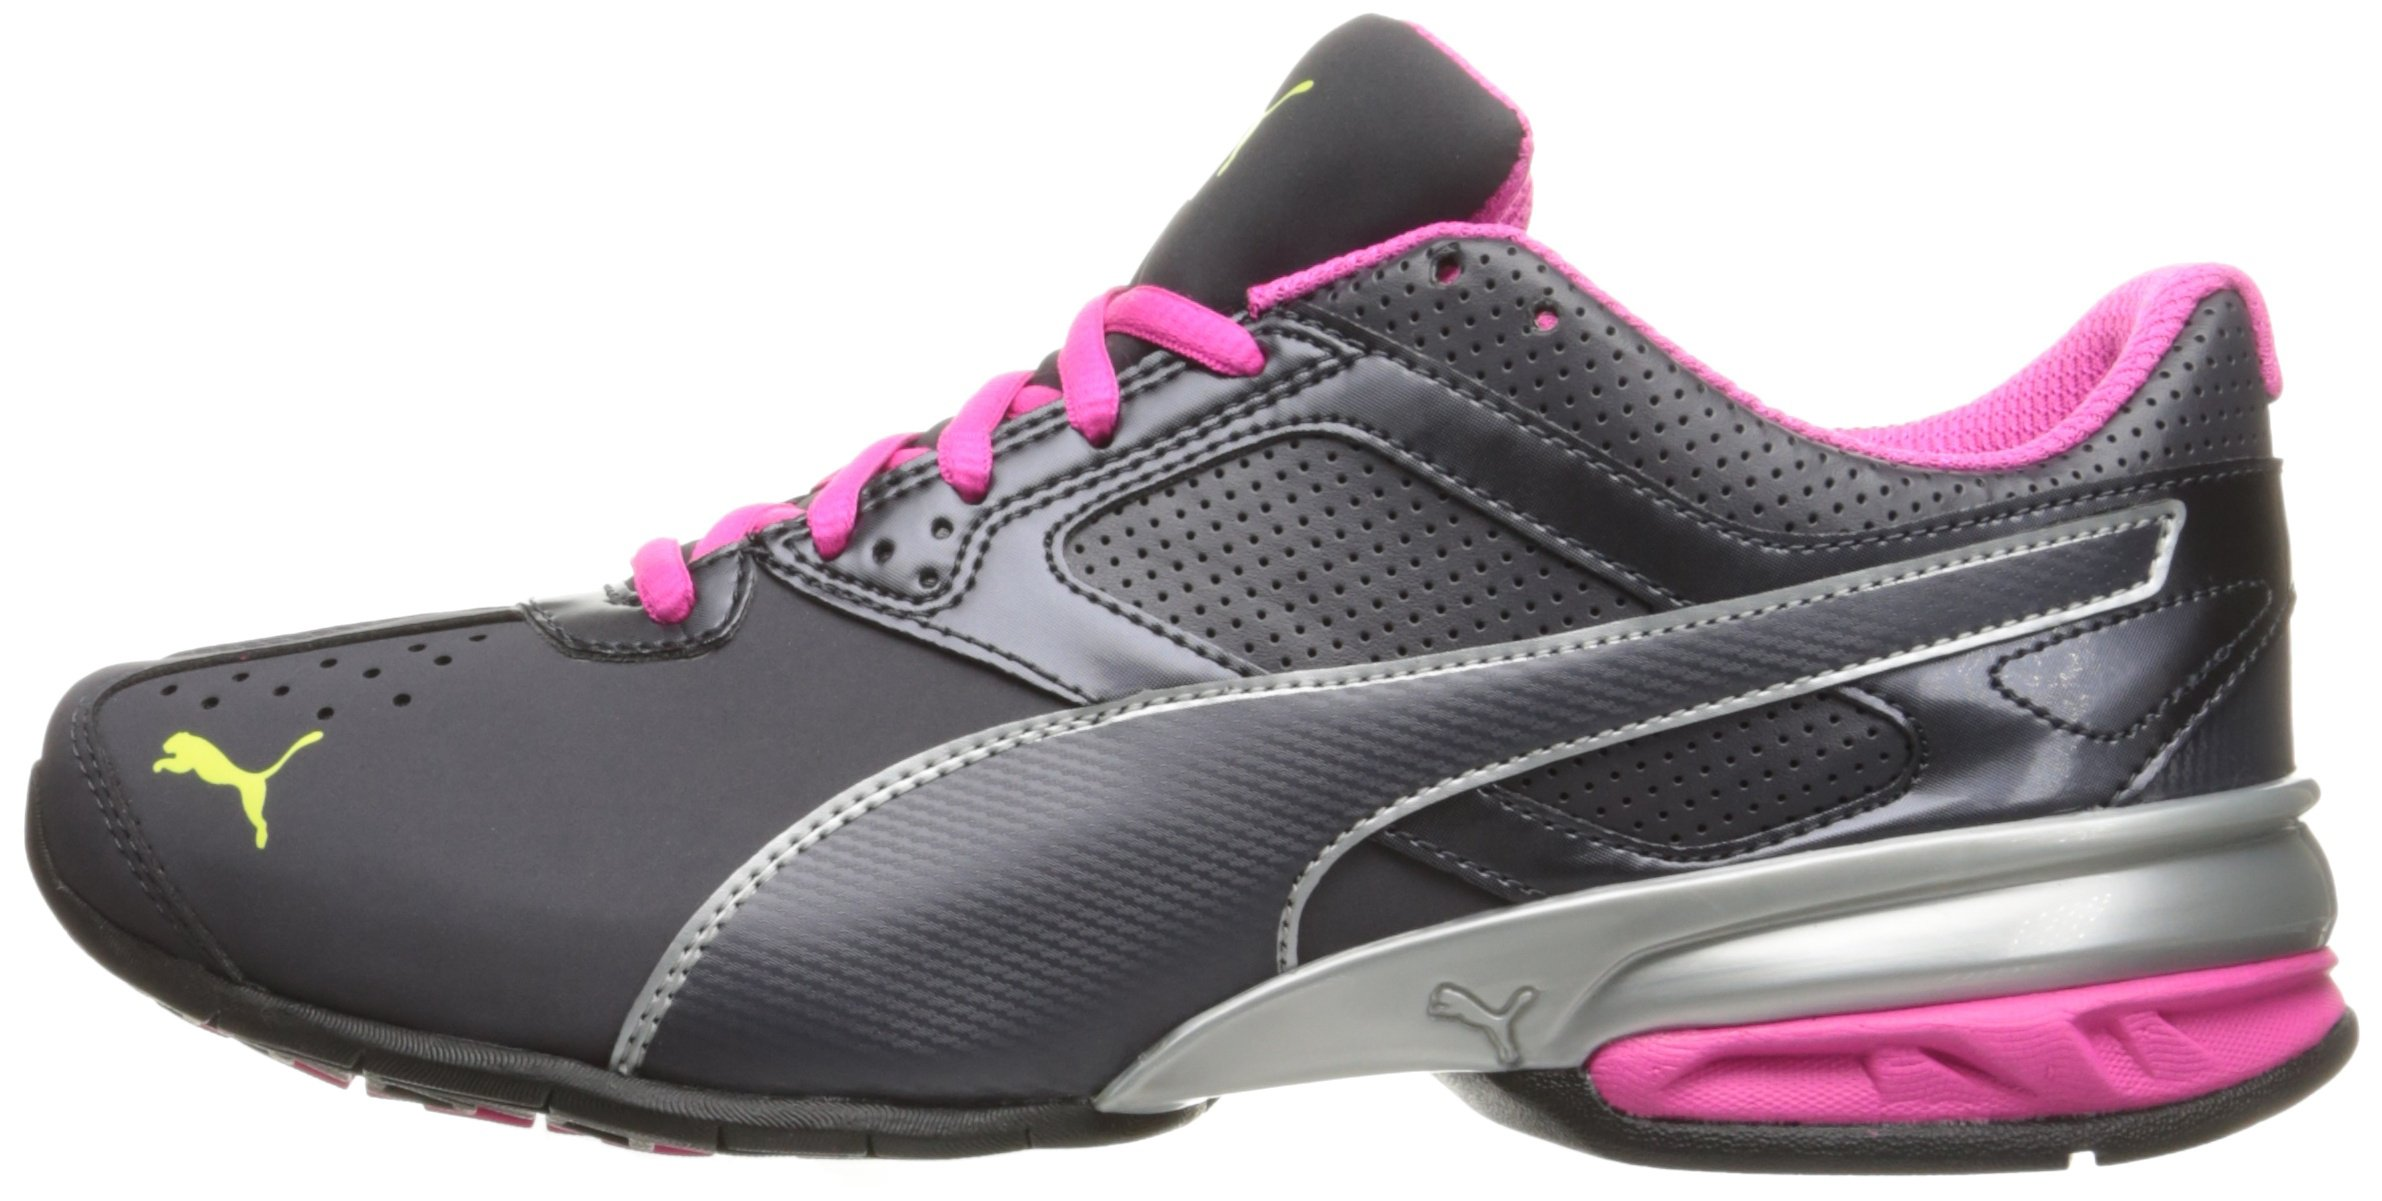 PUMA Women's Tazon 6 WN's fm Sneaker, Periscope Silver-Pink glo, 7 M US by PUMA (Image #5)